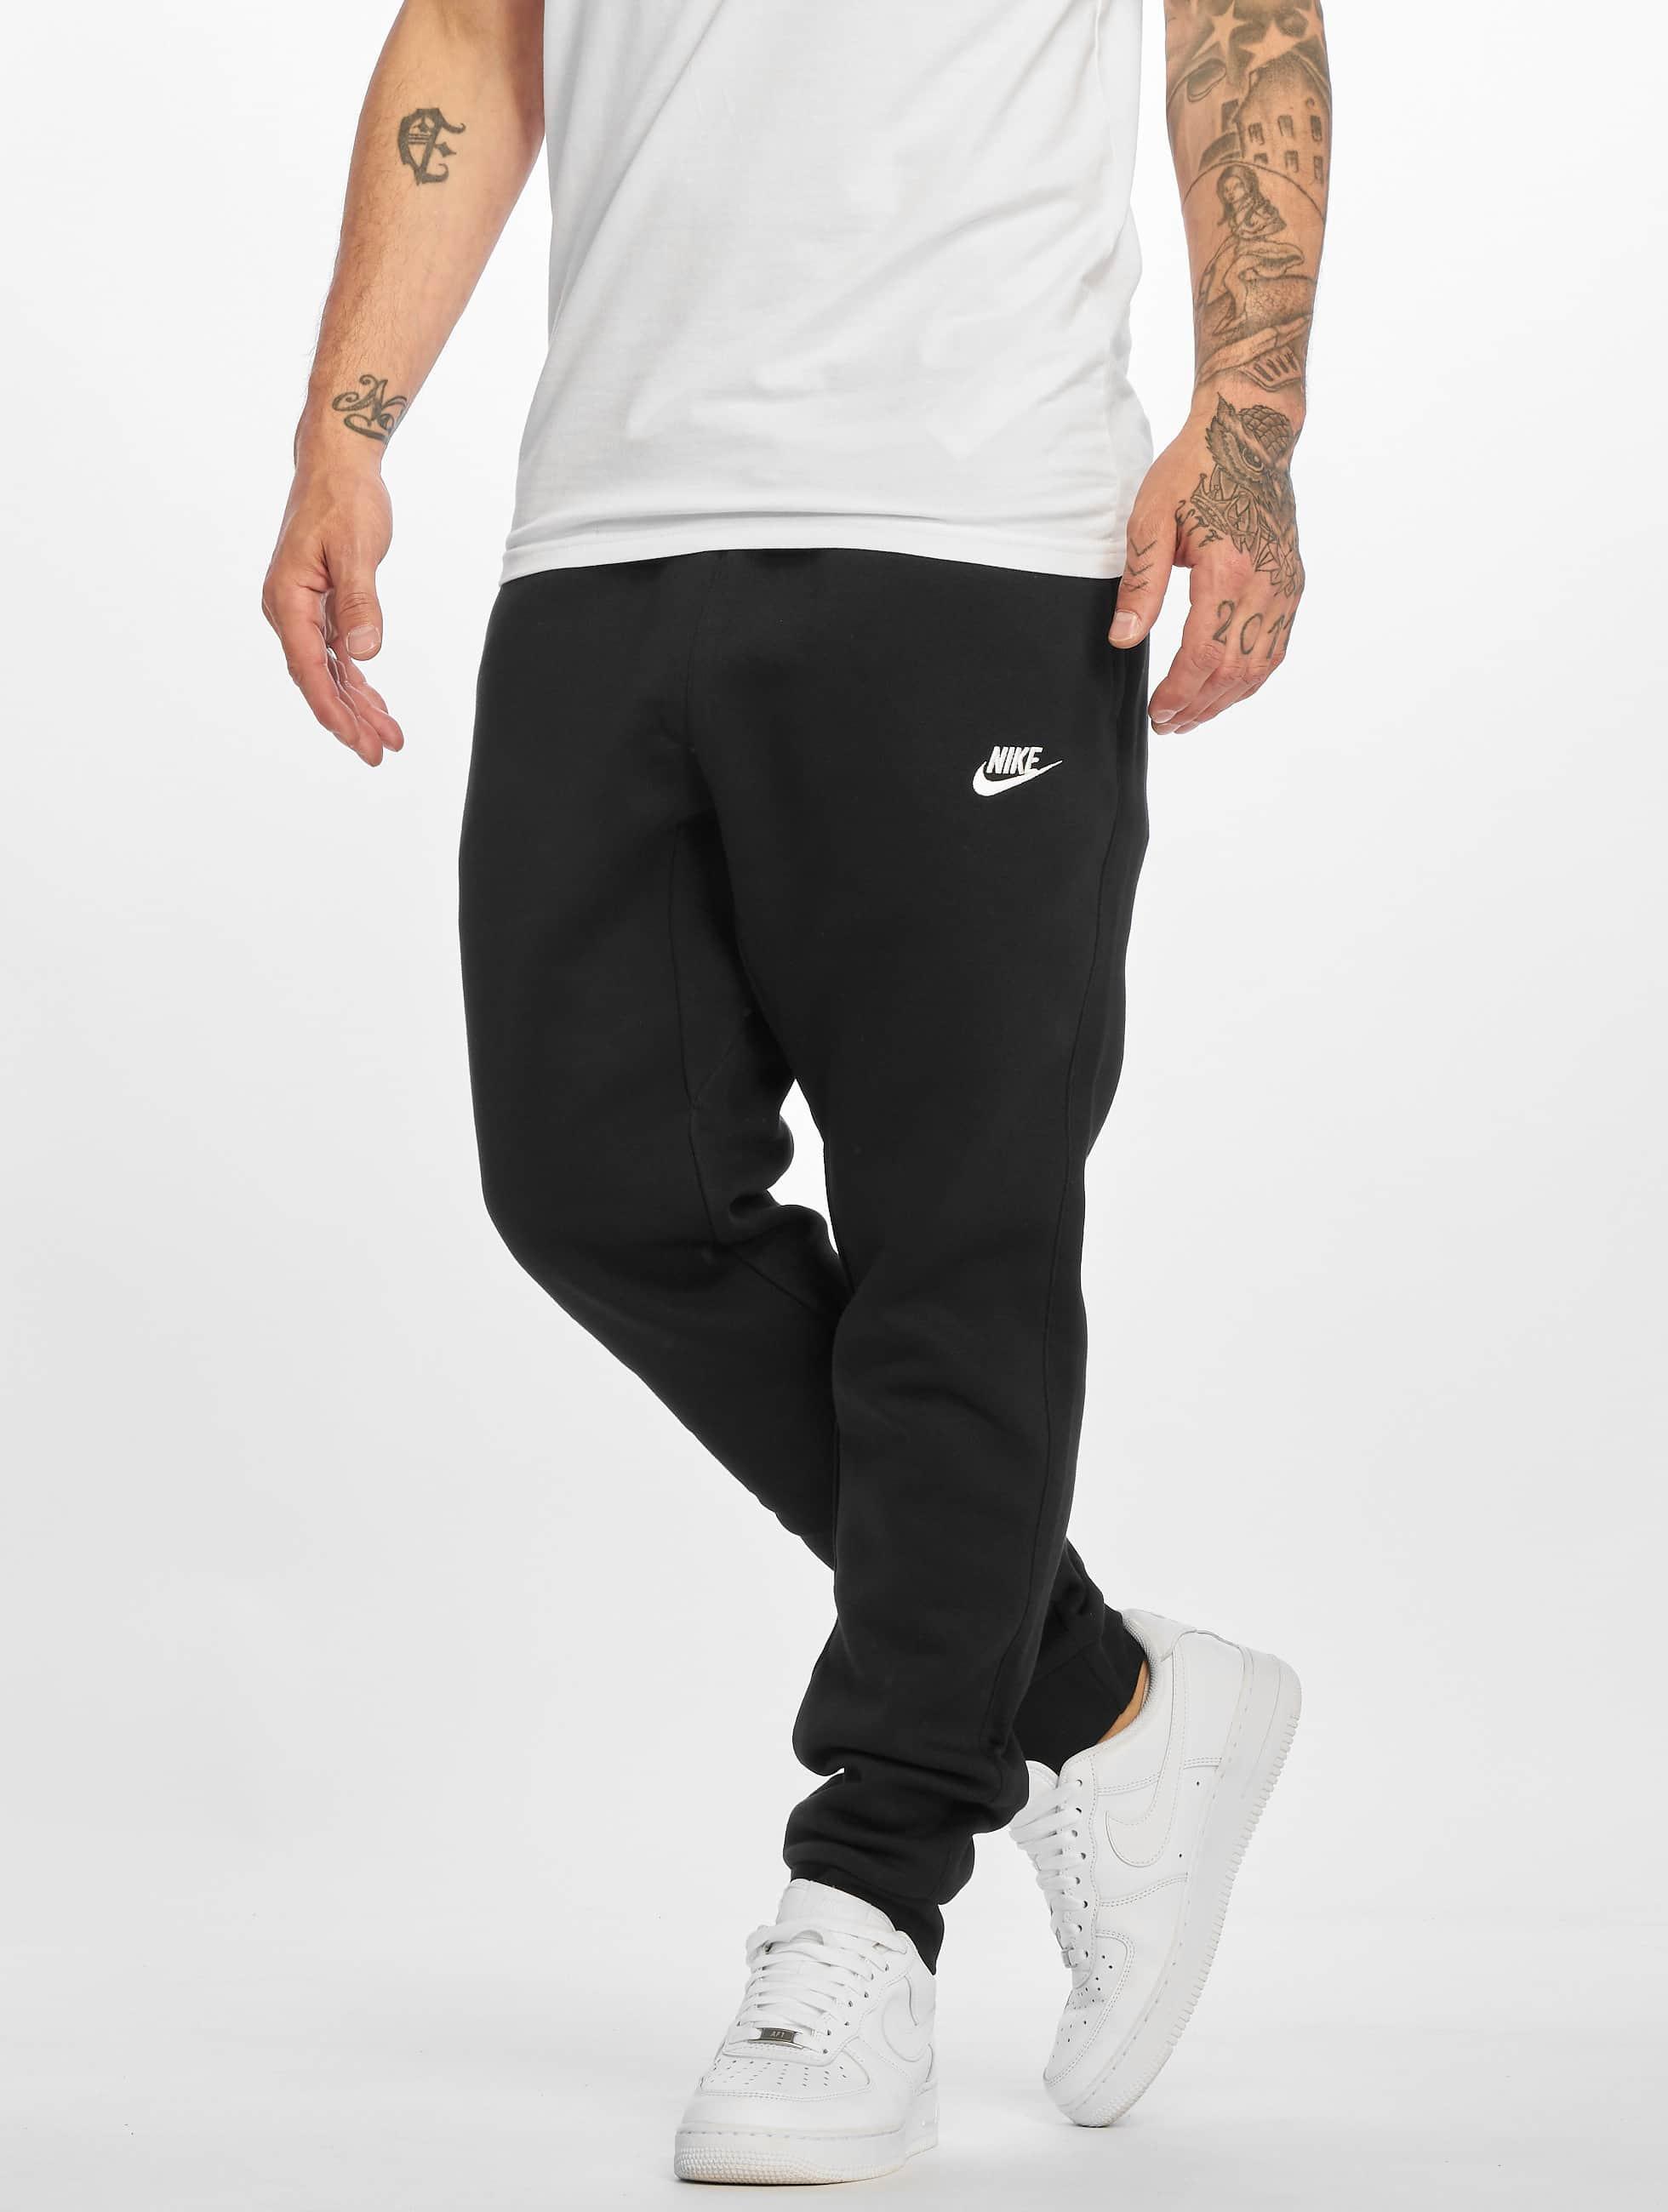 Nike Männer Jogginghose NSW FLC CLUB in schwarz